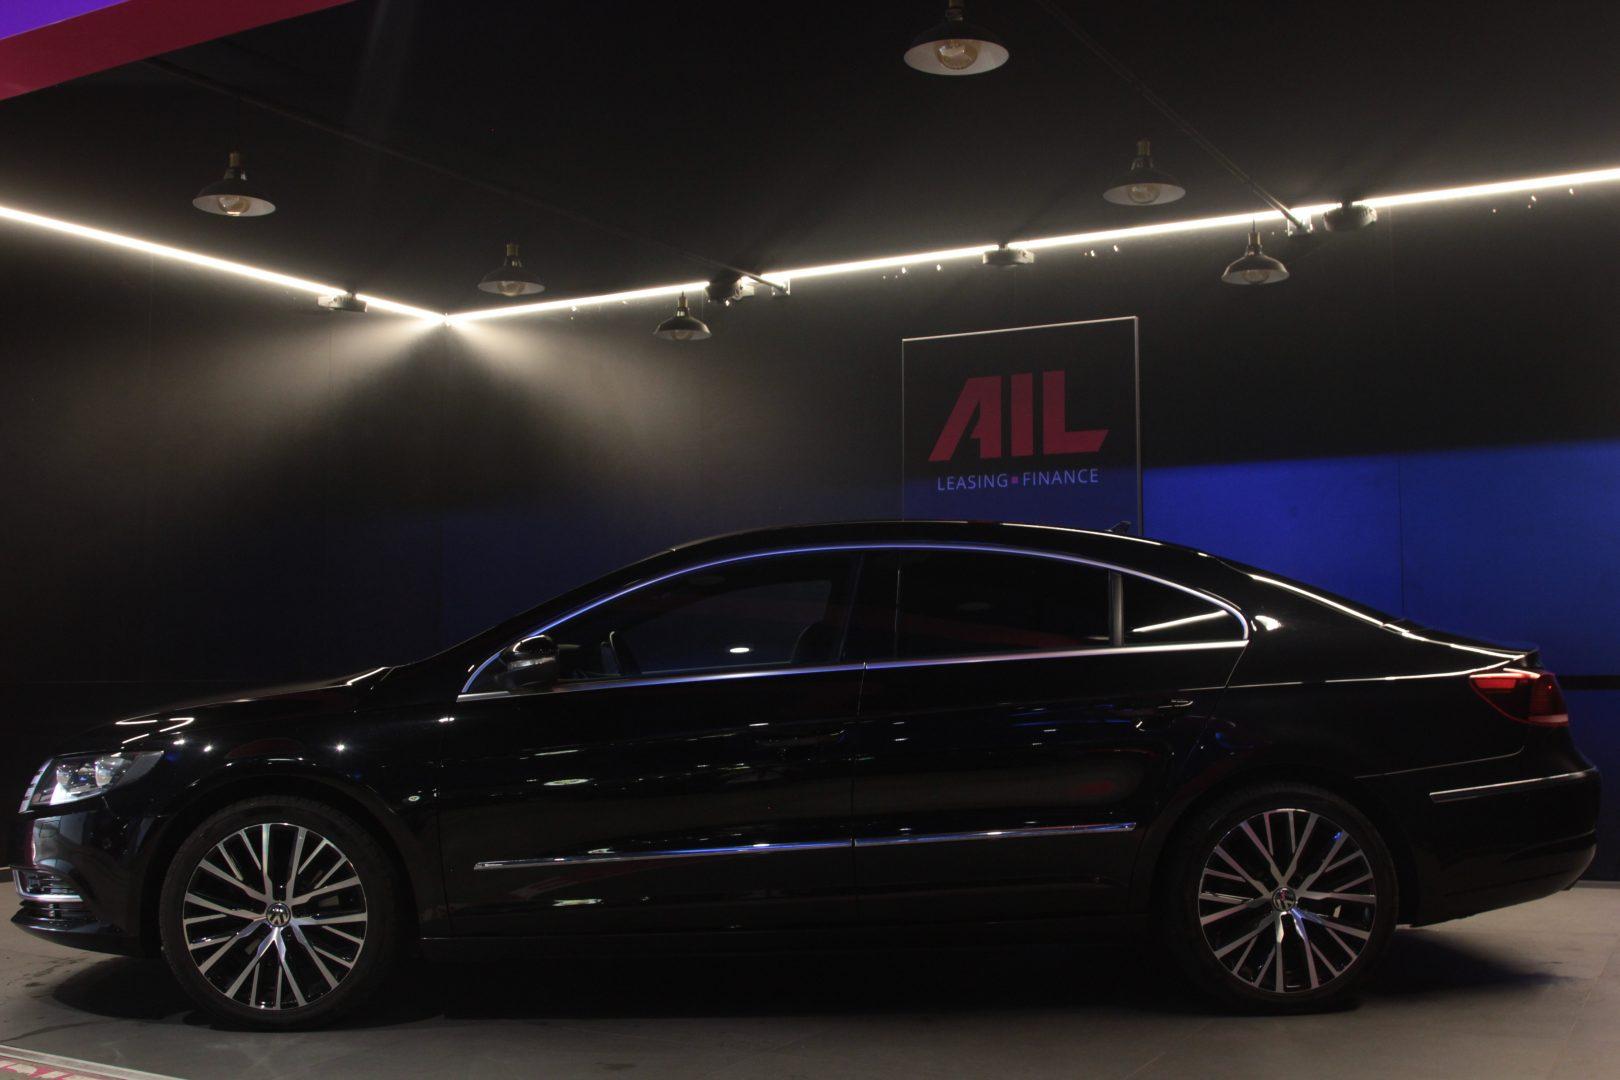 AIL VW CC 2.0TDI Basis BMT 4Motion DSG 2